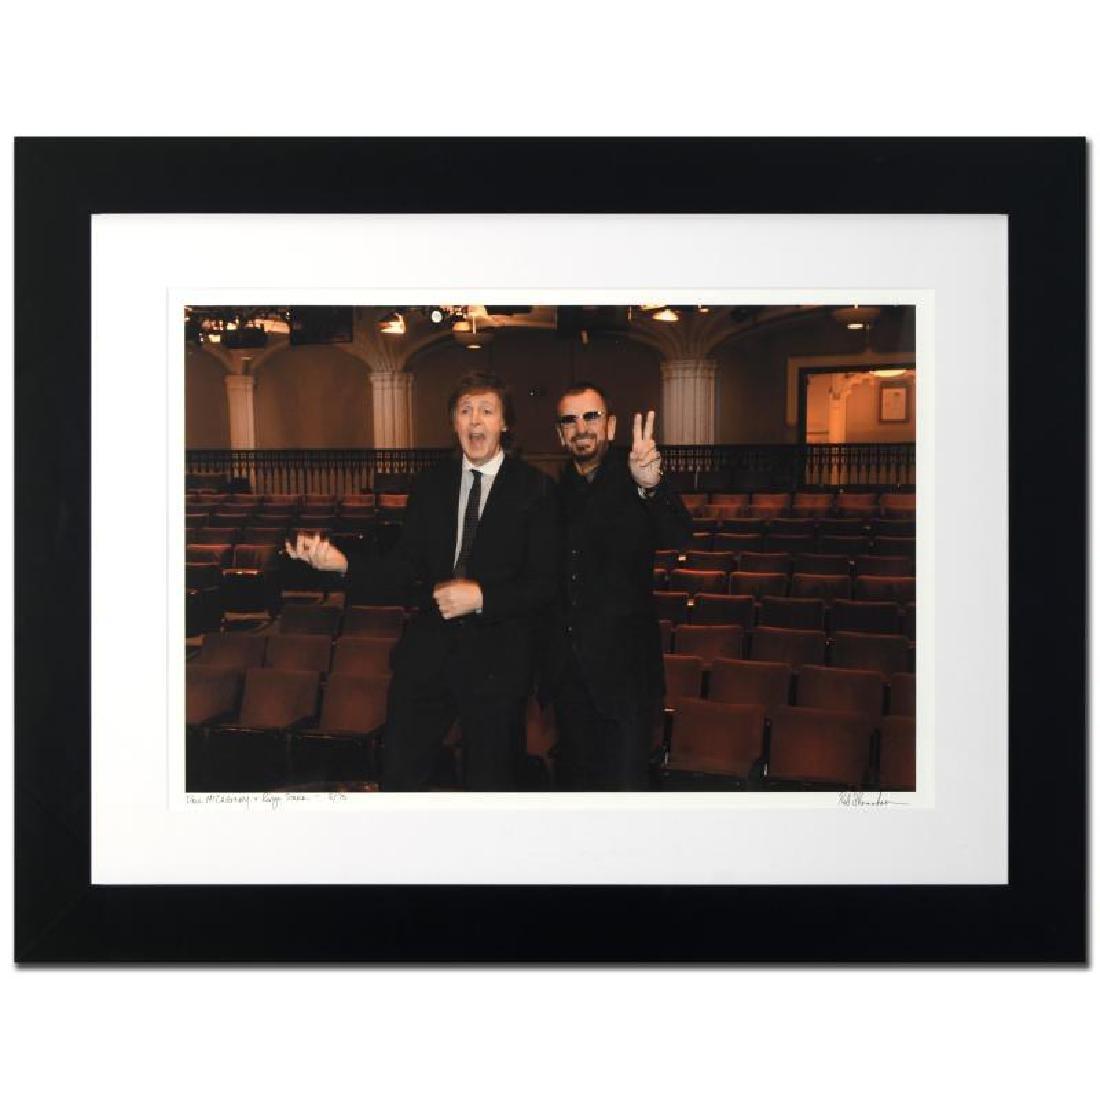 """Paul McCartney & Ringo Starr"" Limited Edition Giclee"